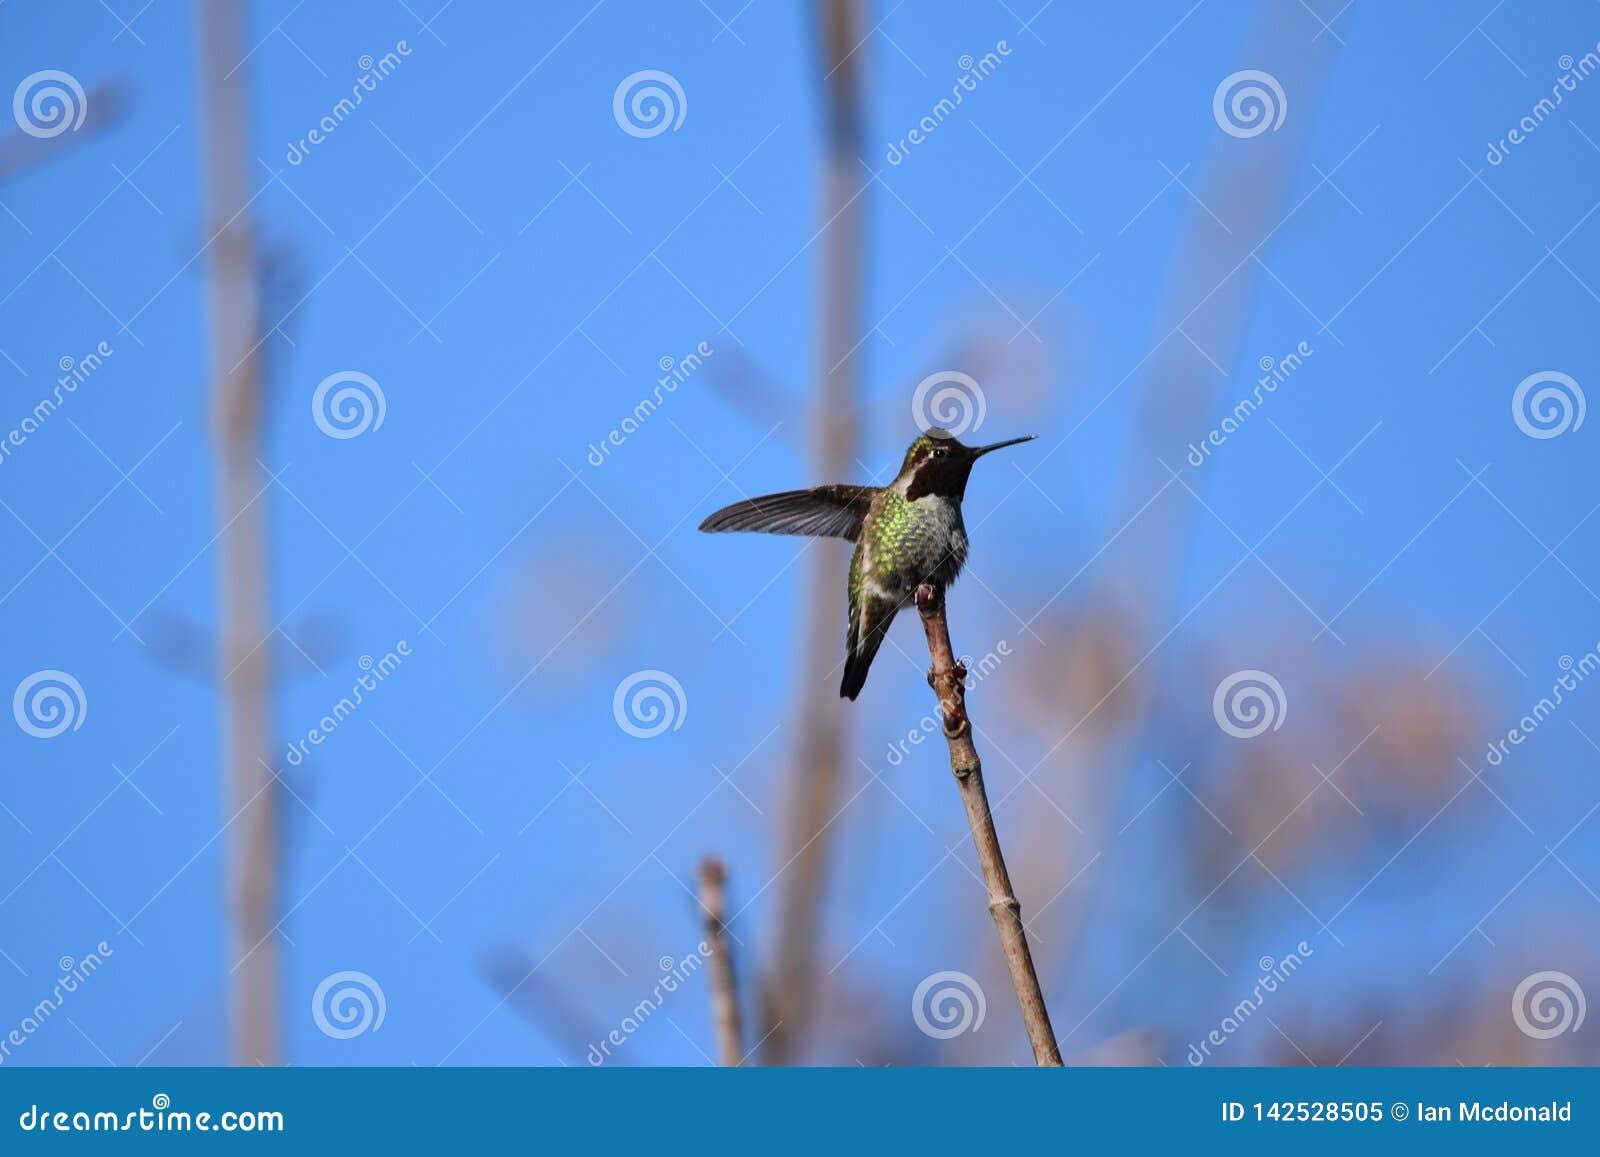 Porträt eines Kolibris